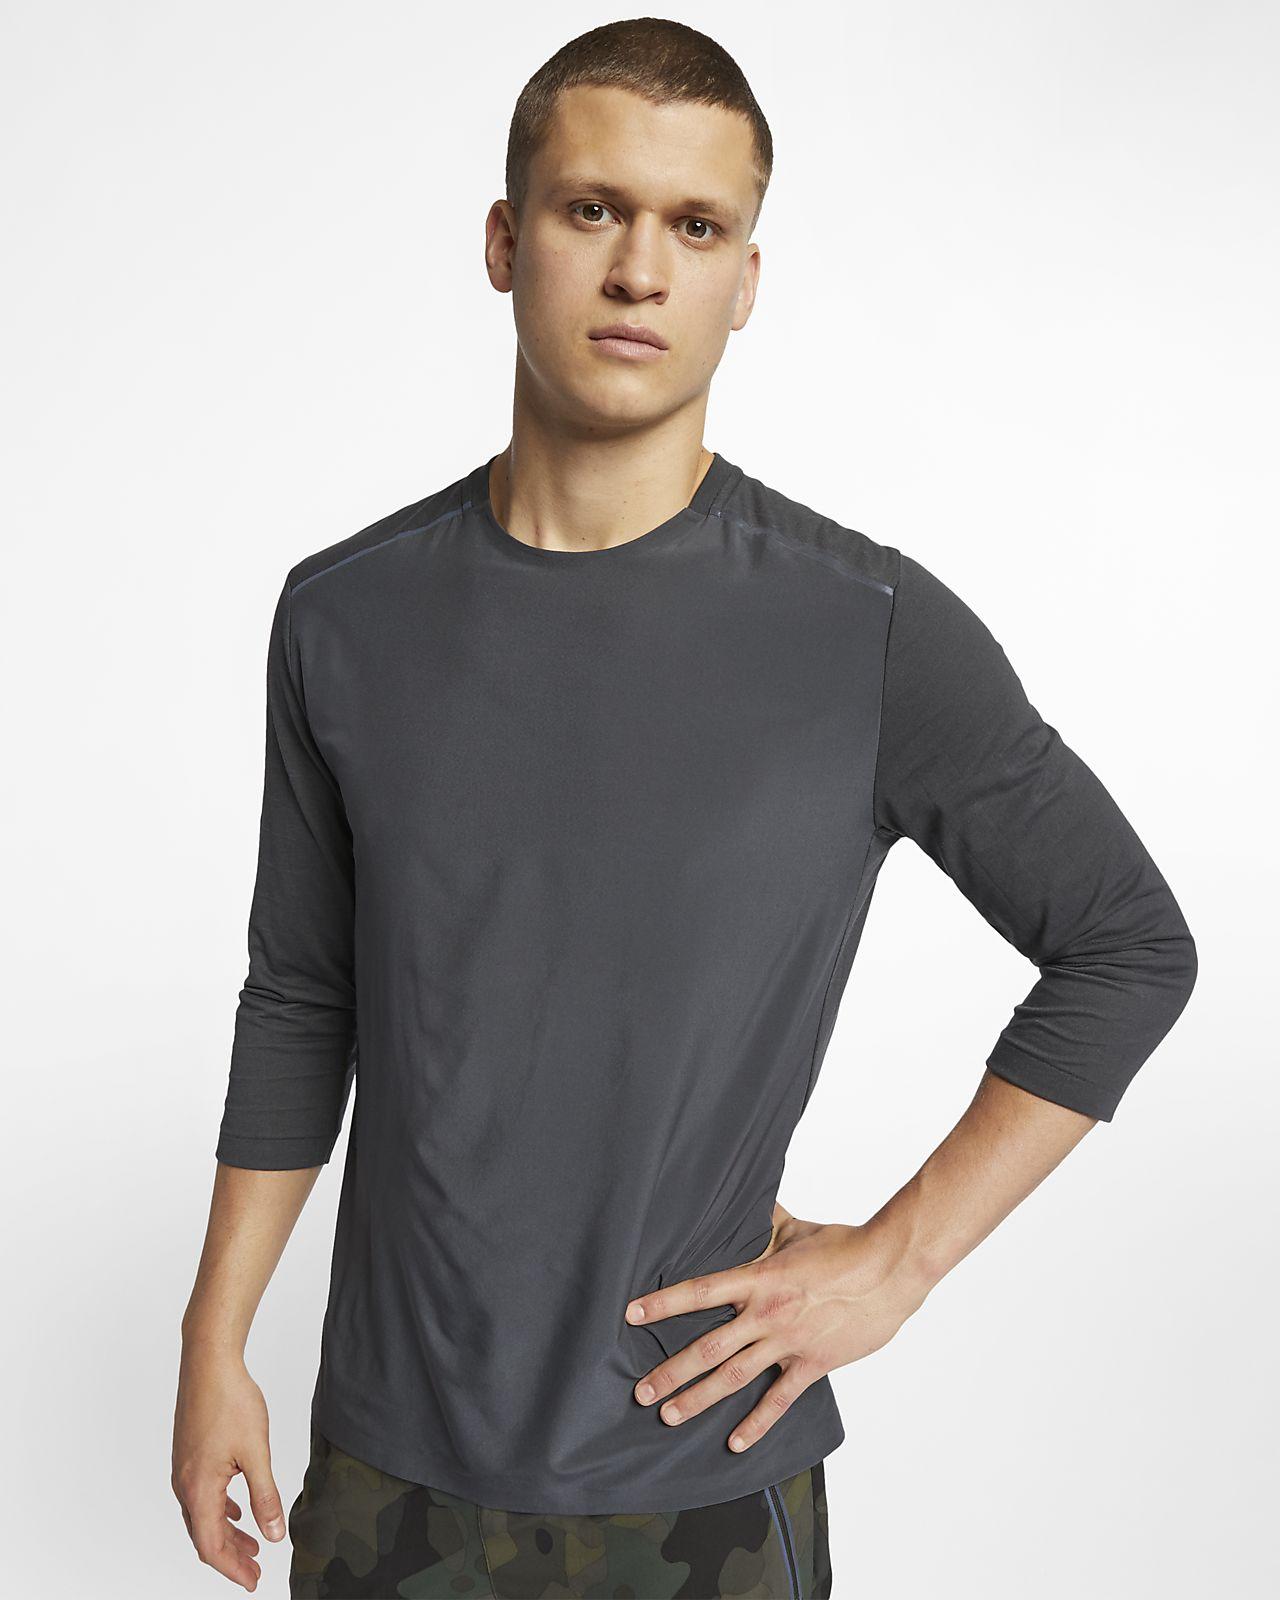 Prenda para la parte superior de 3/4 de running para hombre Nike Rise 365 Tech Pack